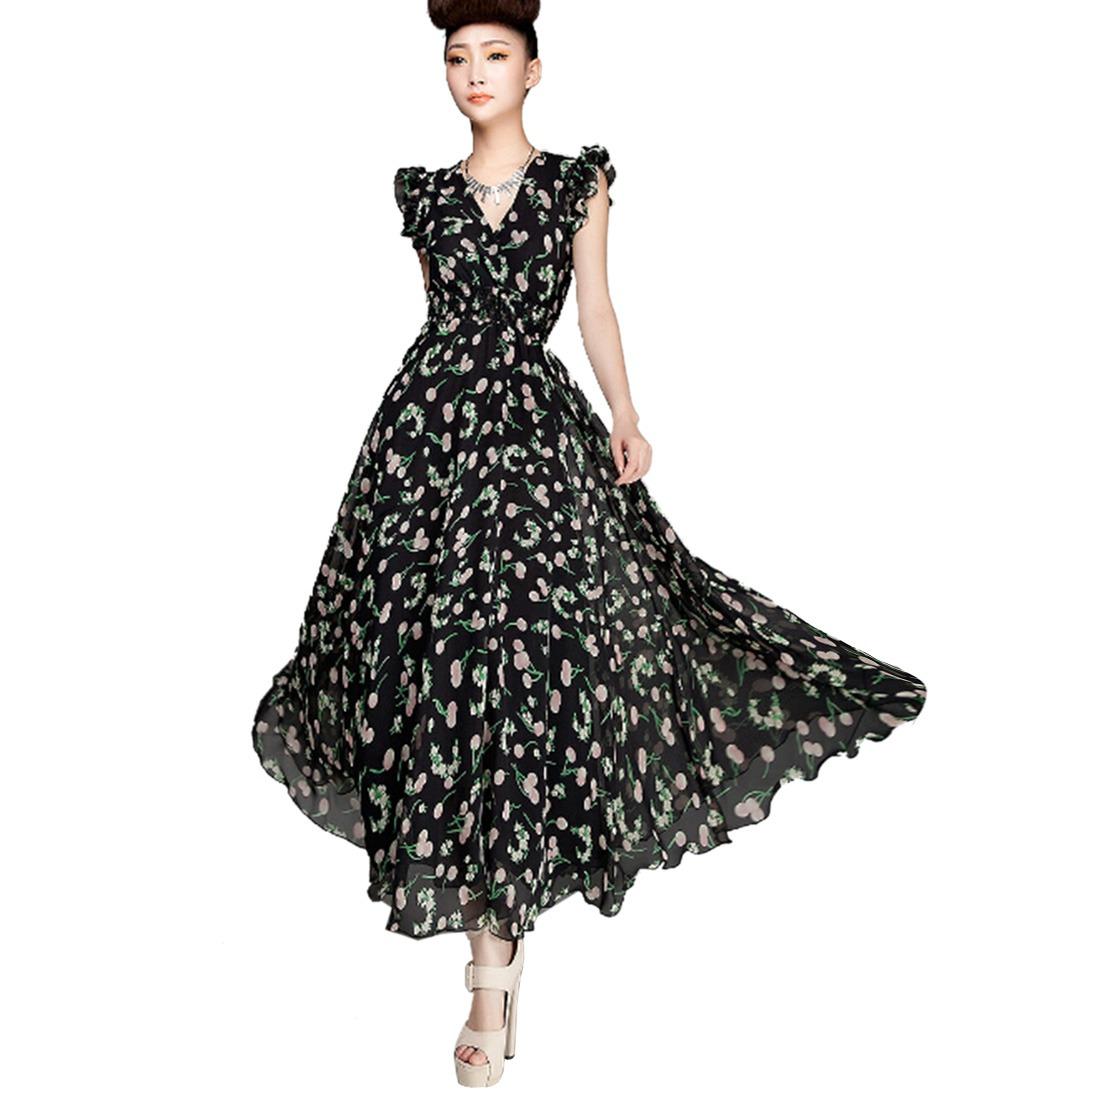 Women Black Base Cherry Printed V-Neck Sleeveless Falbala Ol Tunic Long Dress